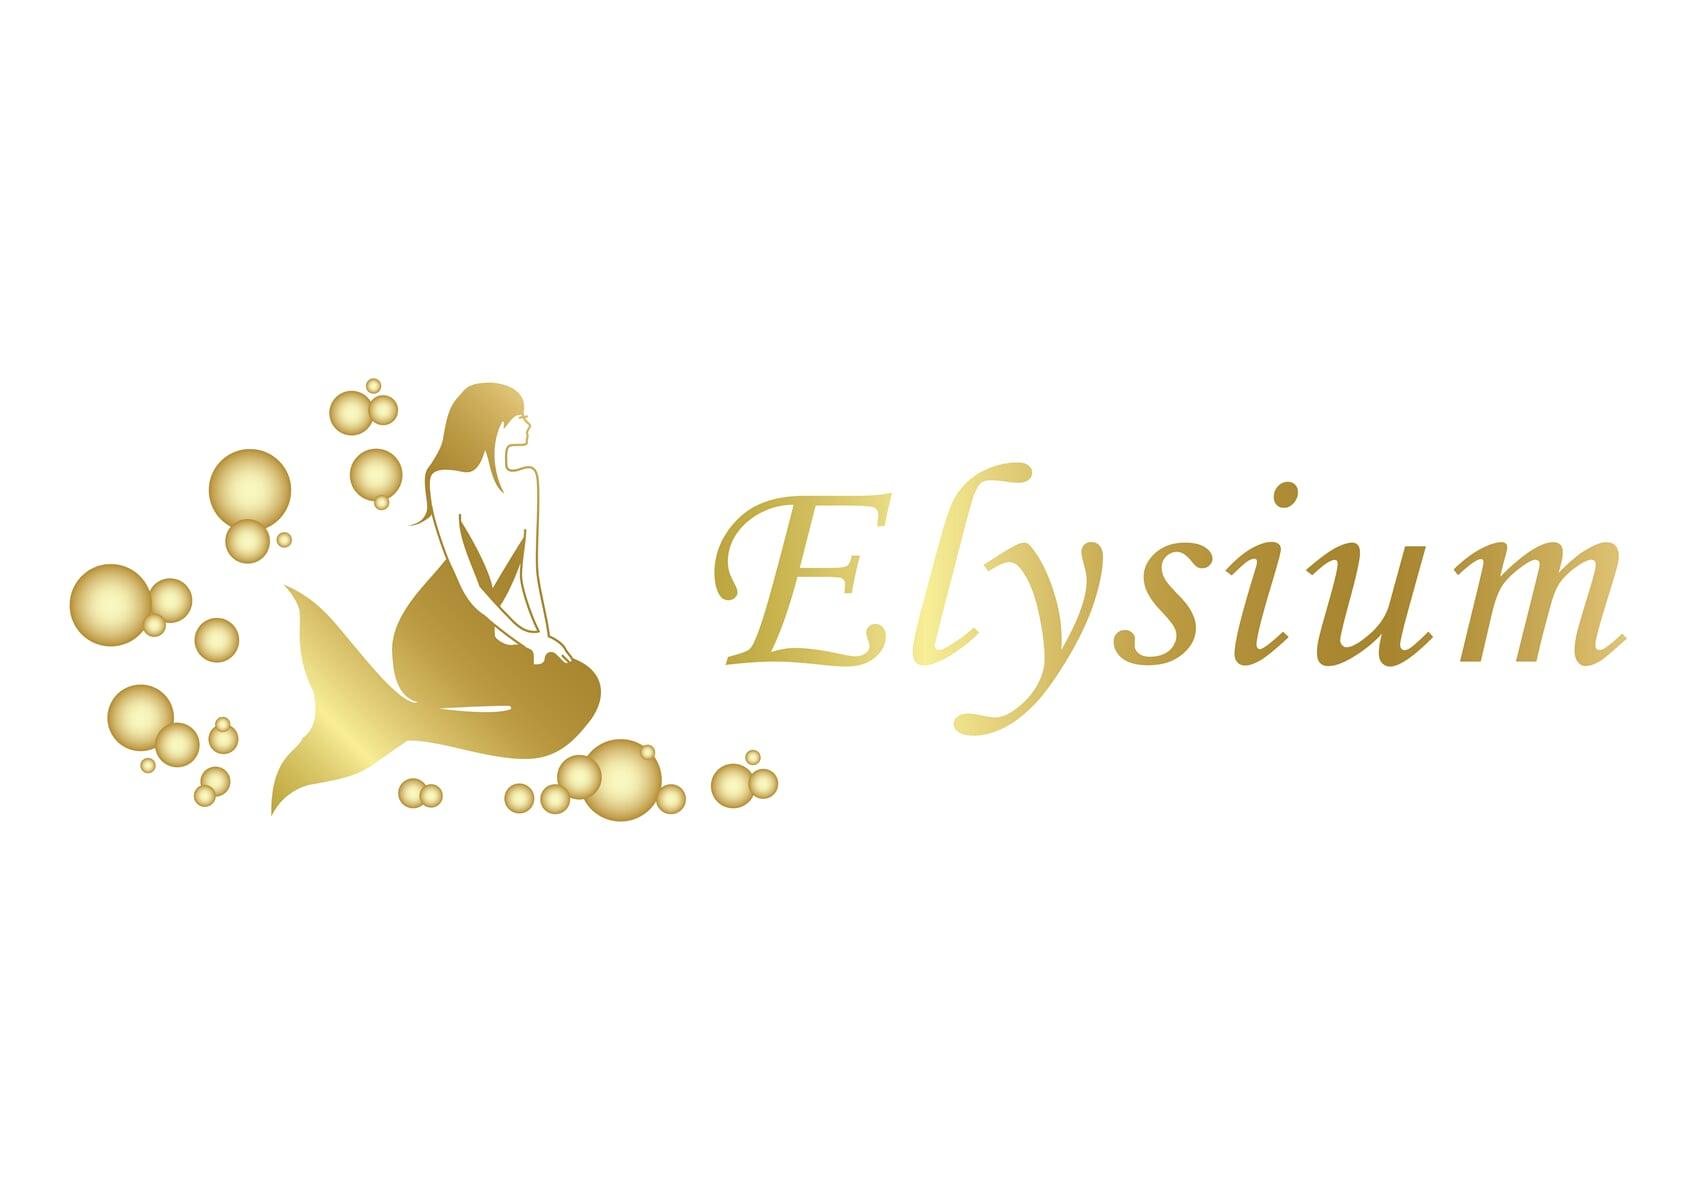 Elysium flooring in Sarasota, FL from Floors and Walls of Distinction